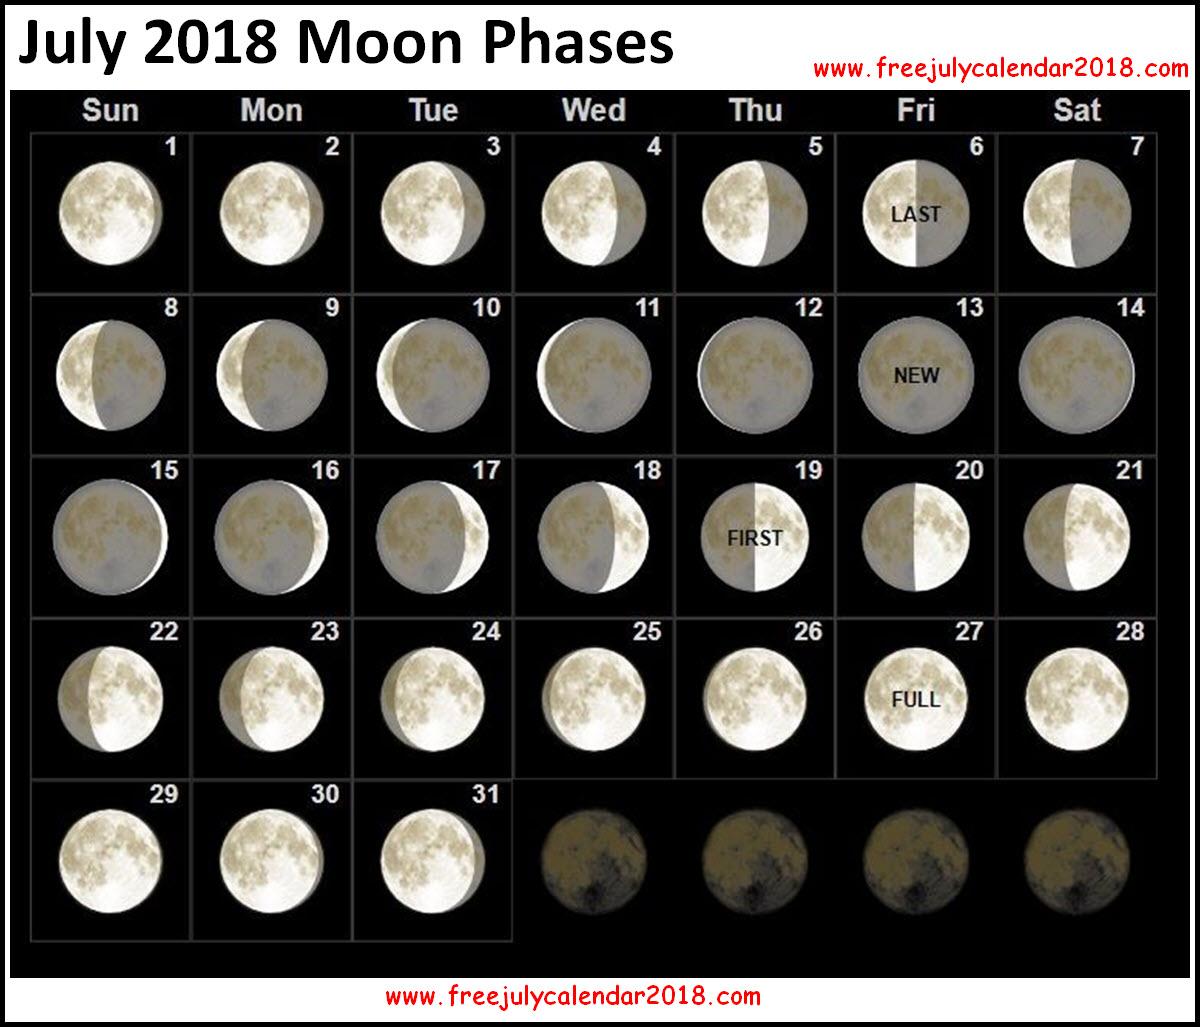 Lunar calendar for July 2018 58